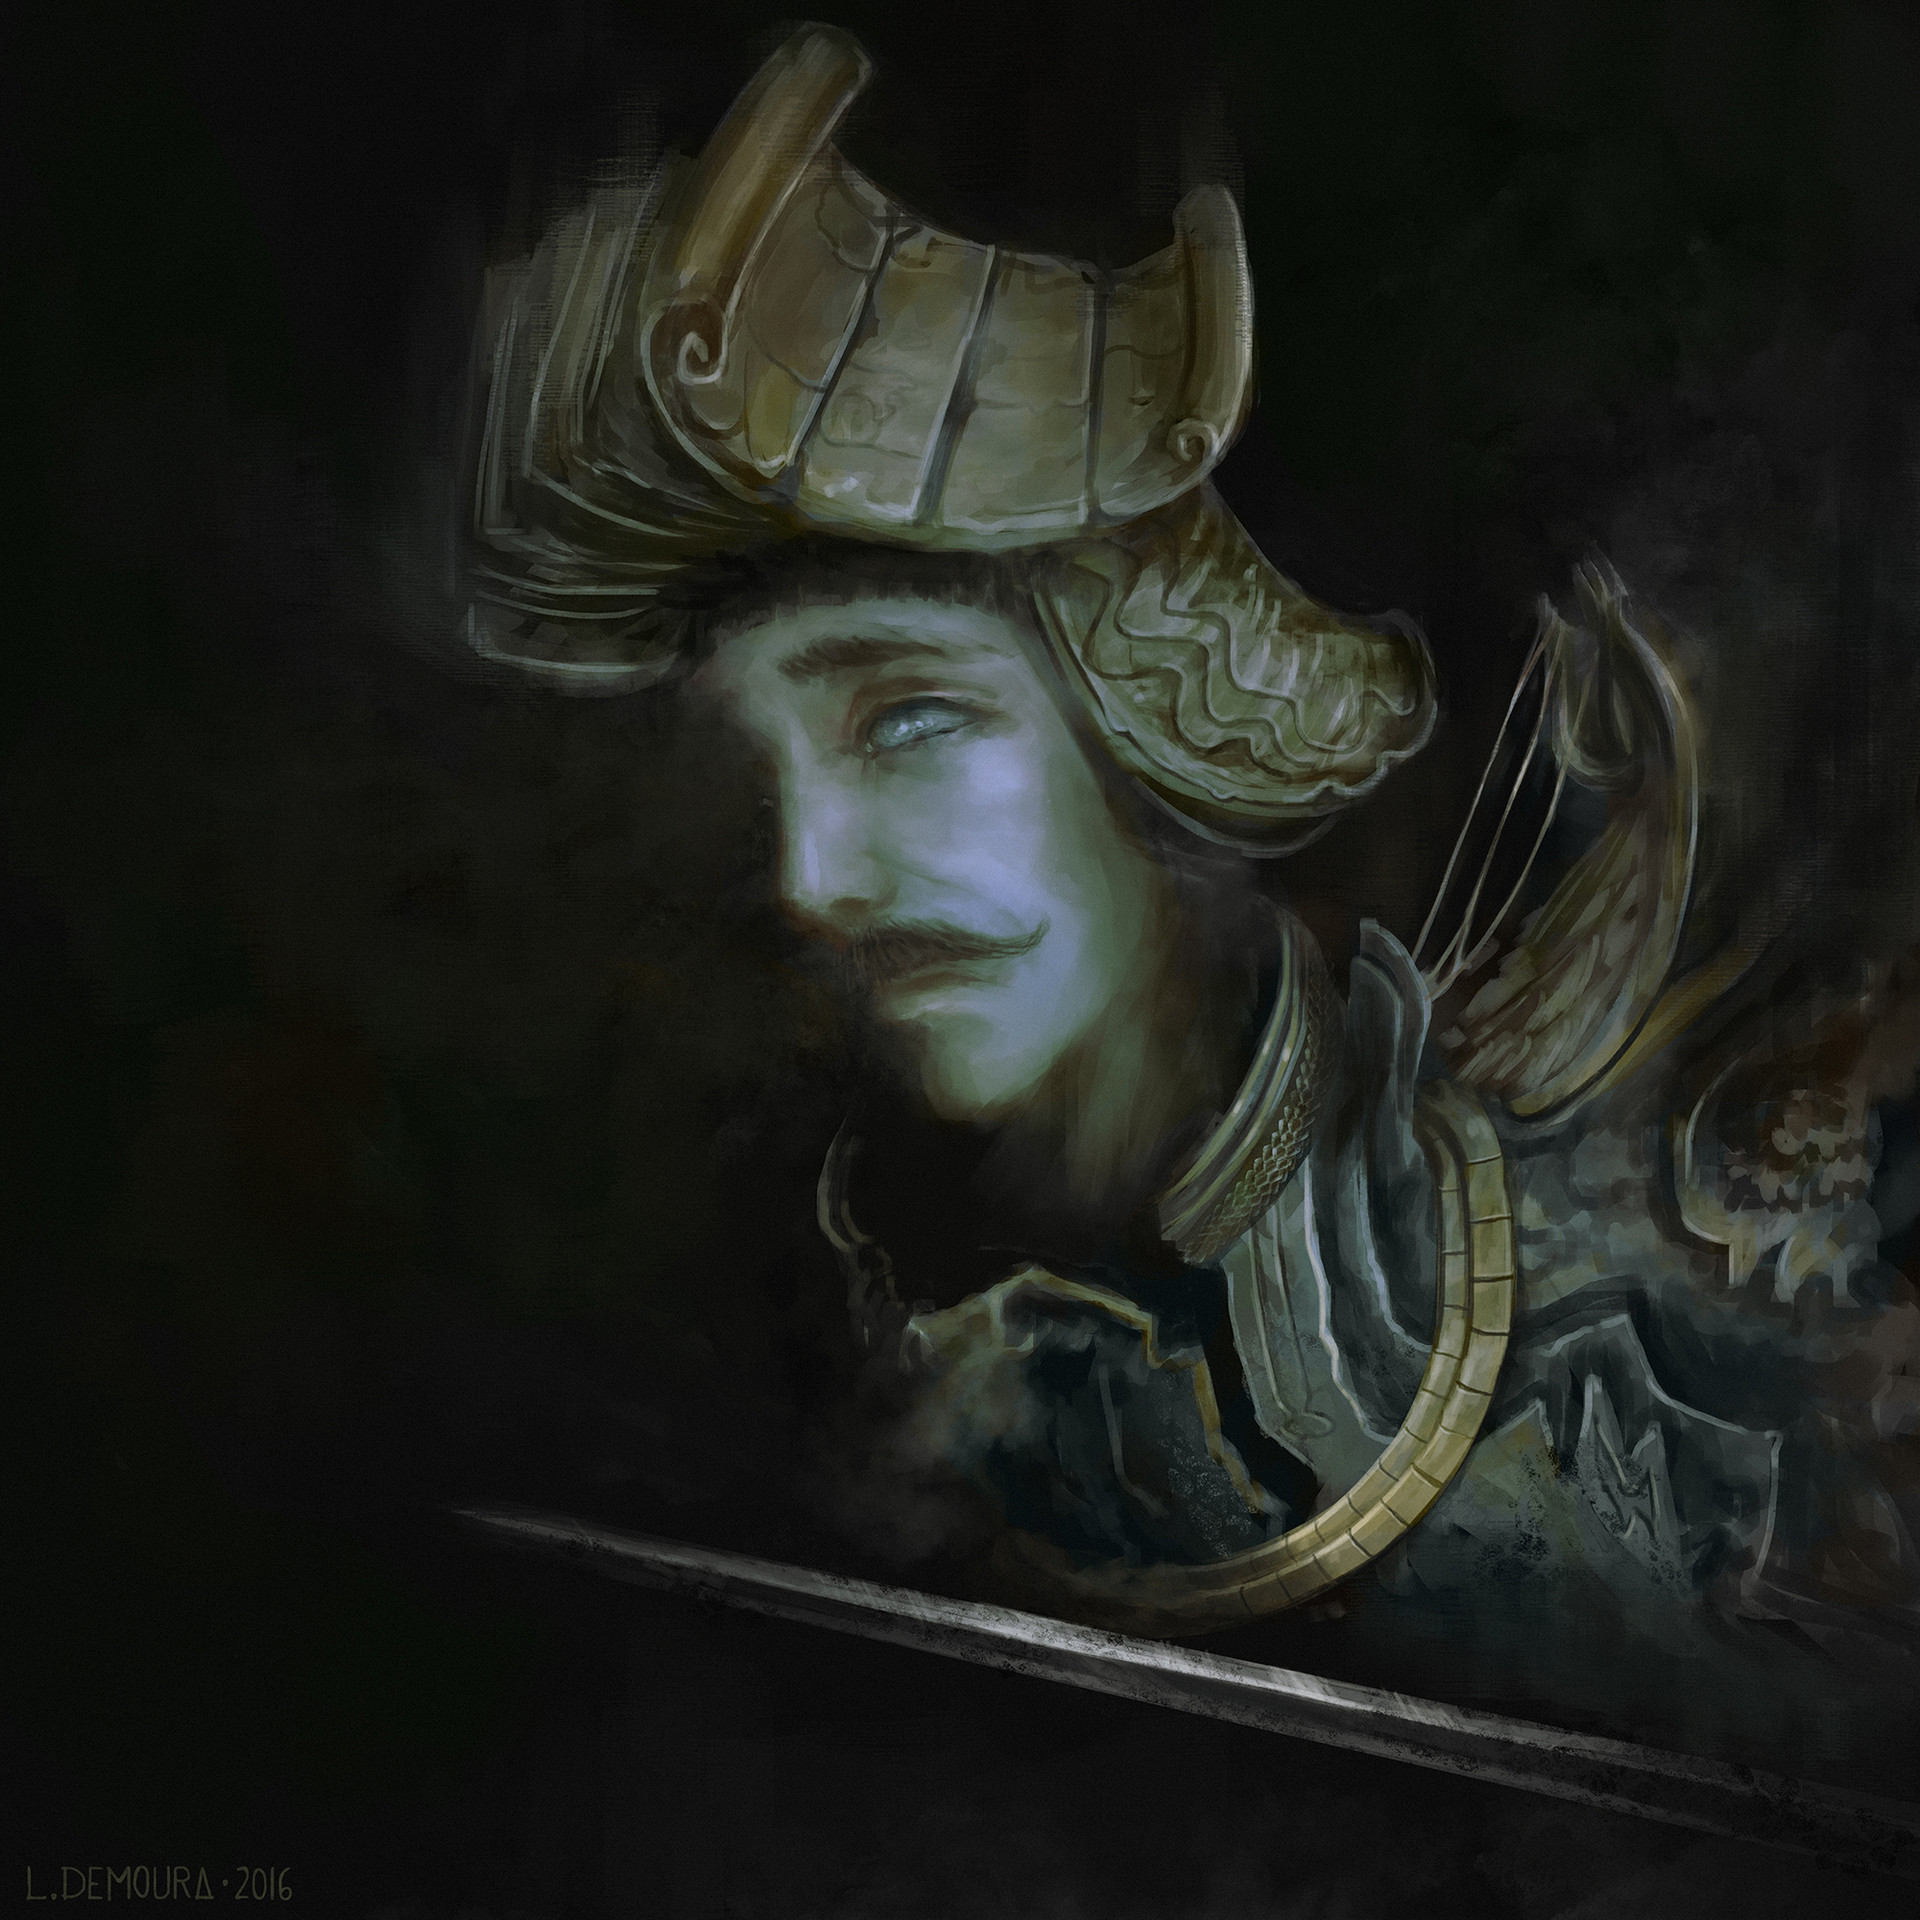 Leonardo de moura estudo rosto penumbra b medium